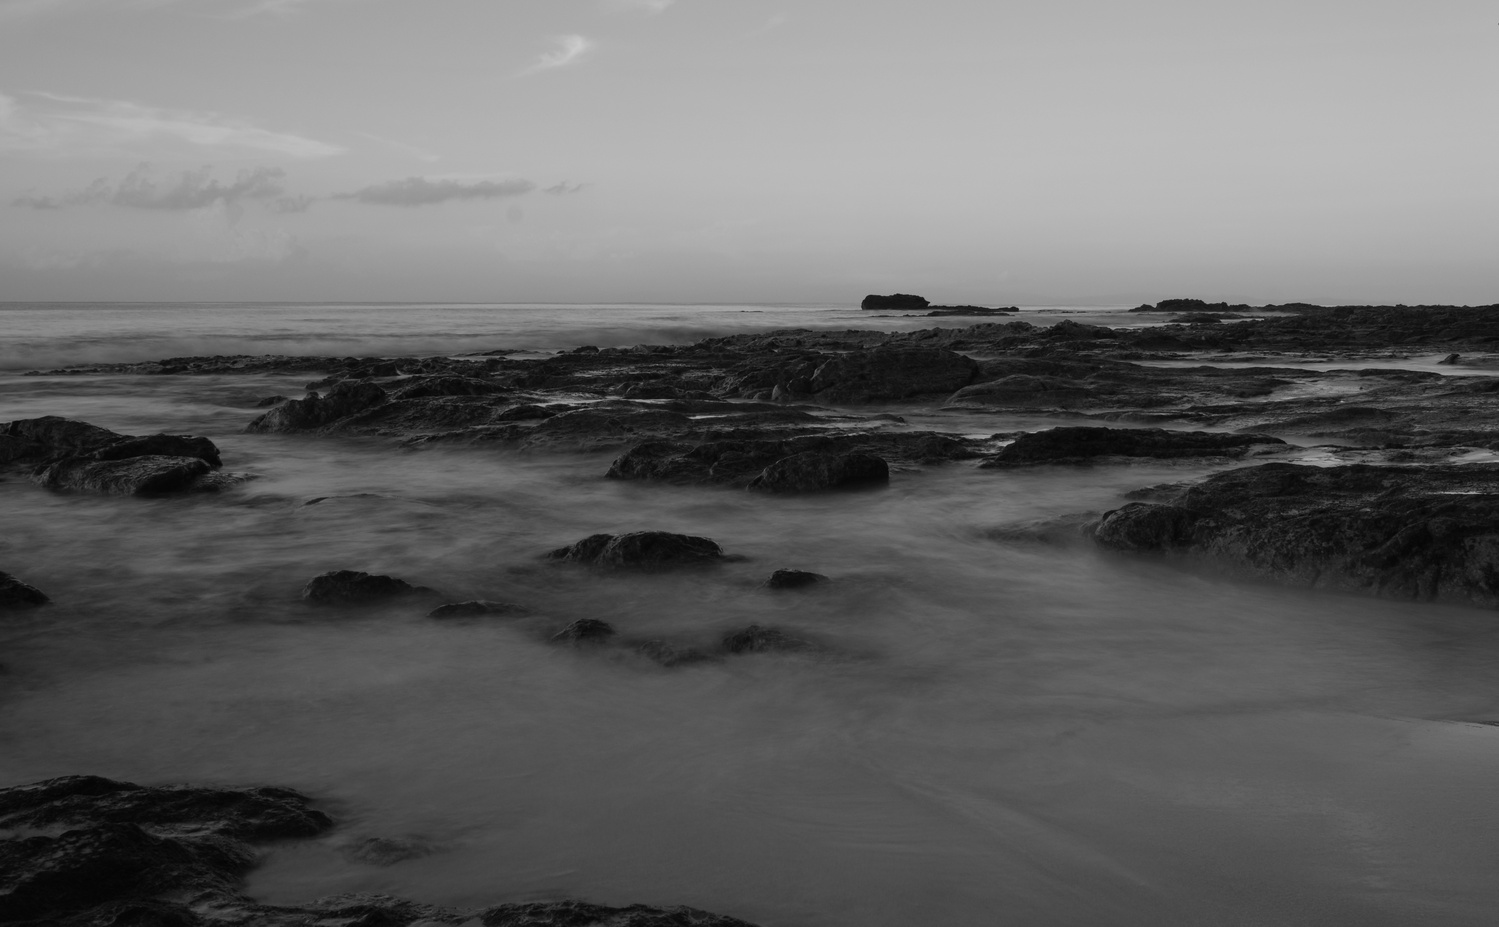 Mystic Sea by Adany Mao